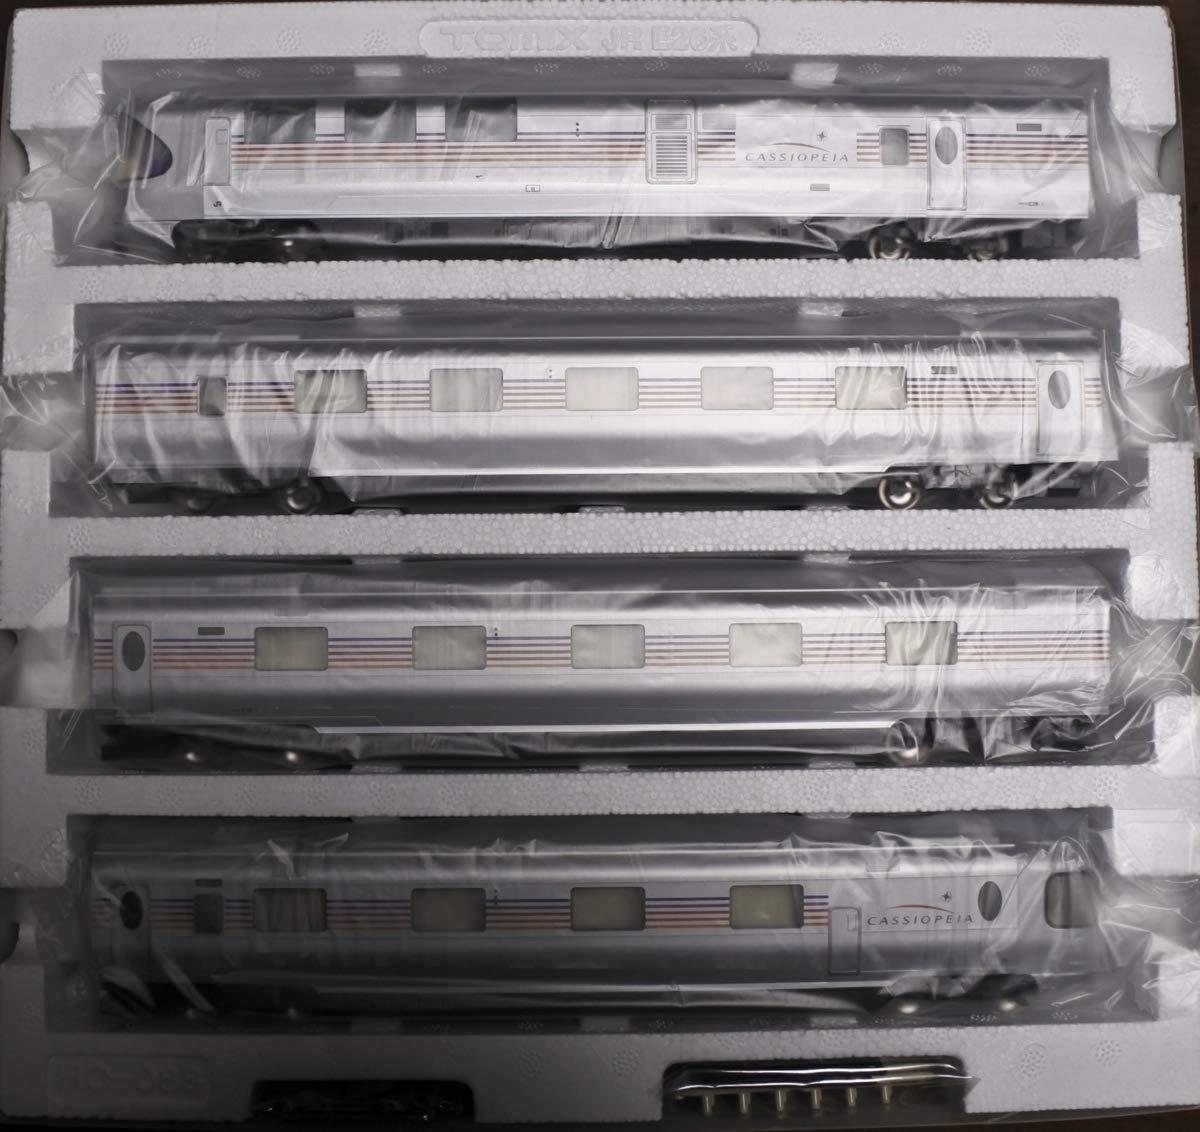 TOMIX HO-9031 JR E26系 特急寝台車(カシオペア)基本セット B 未走行02 B07NTTSB3N